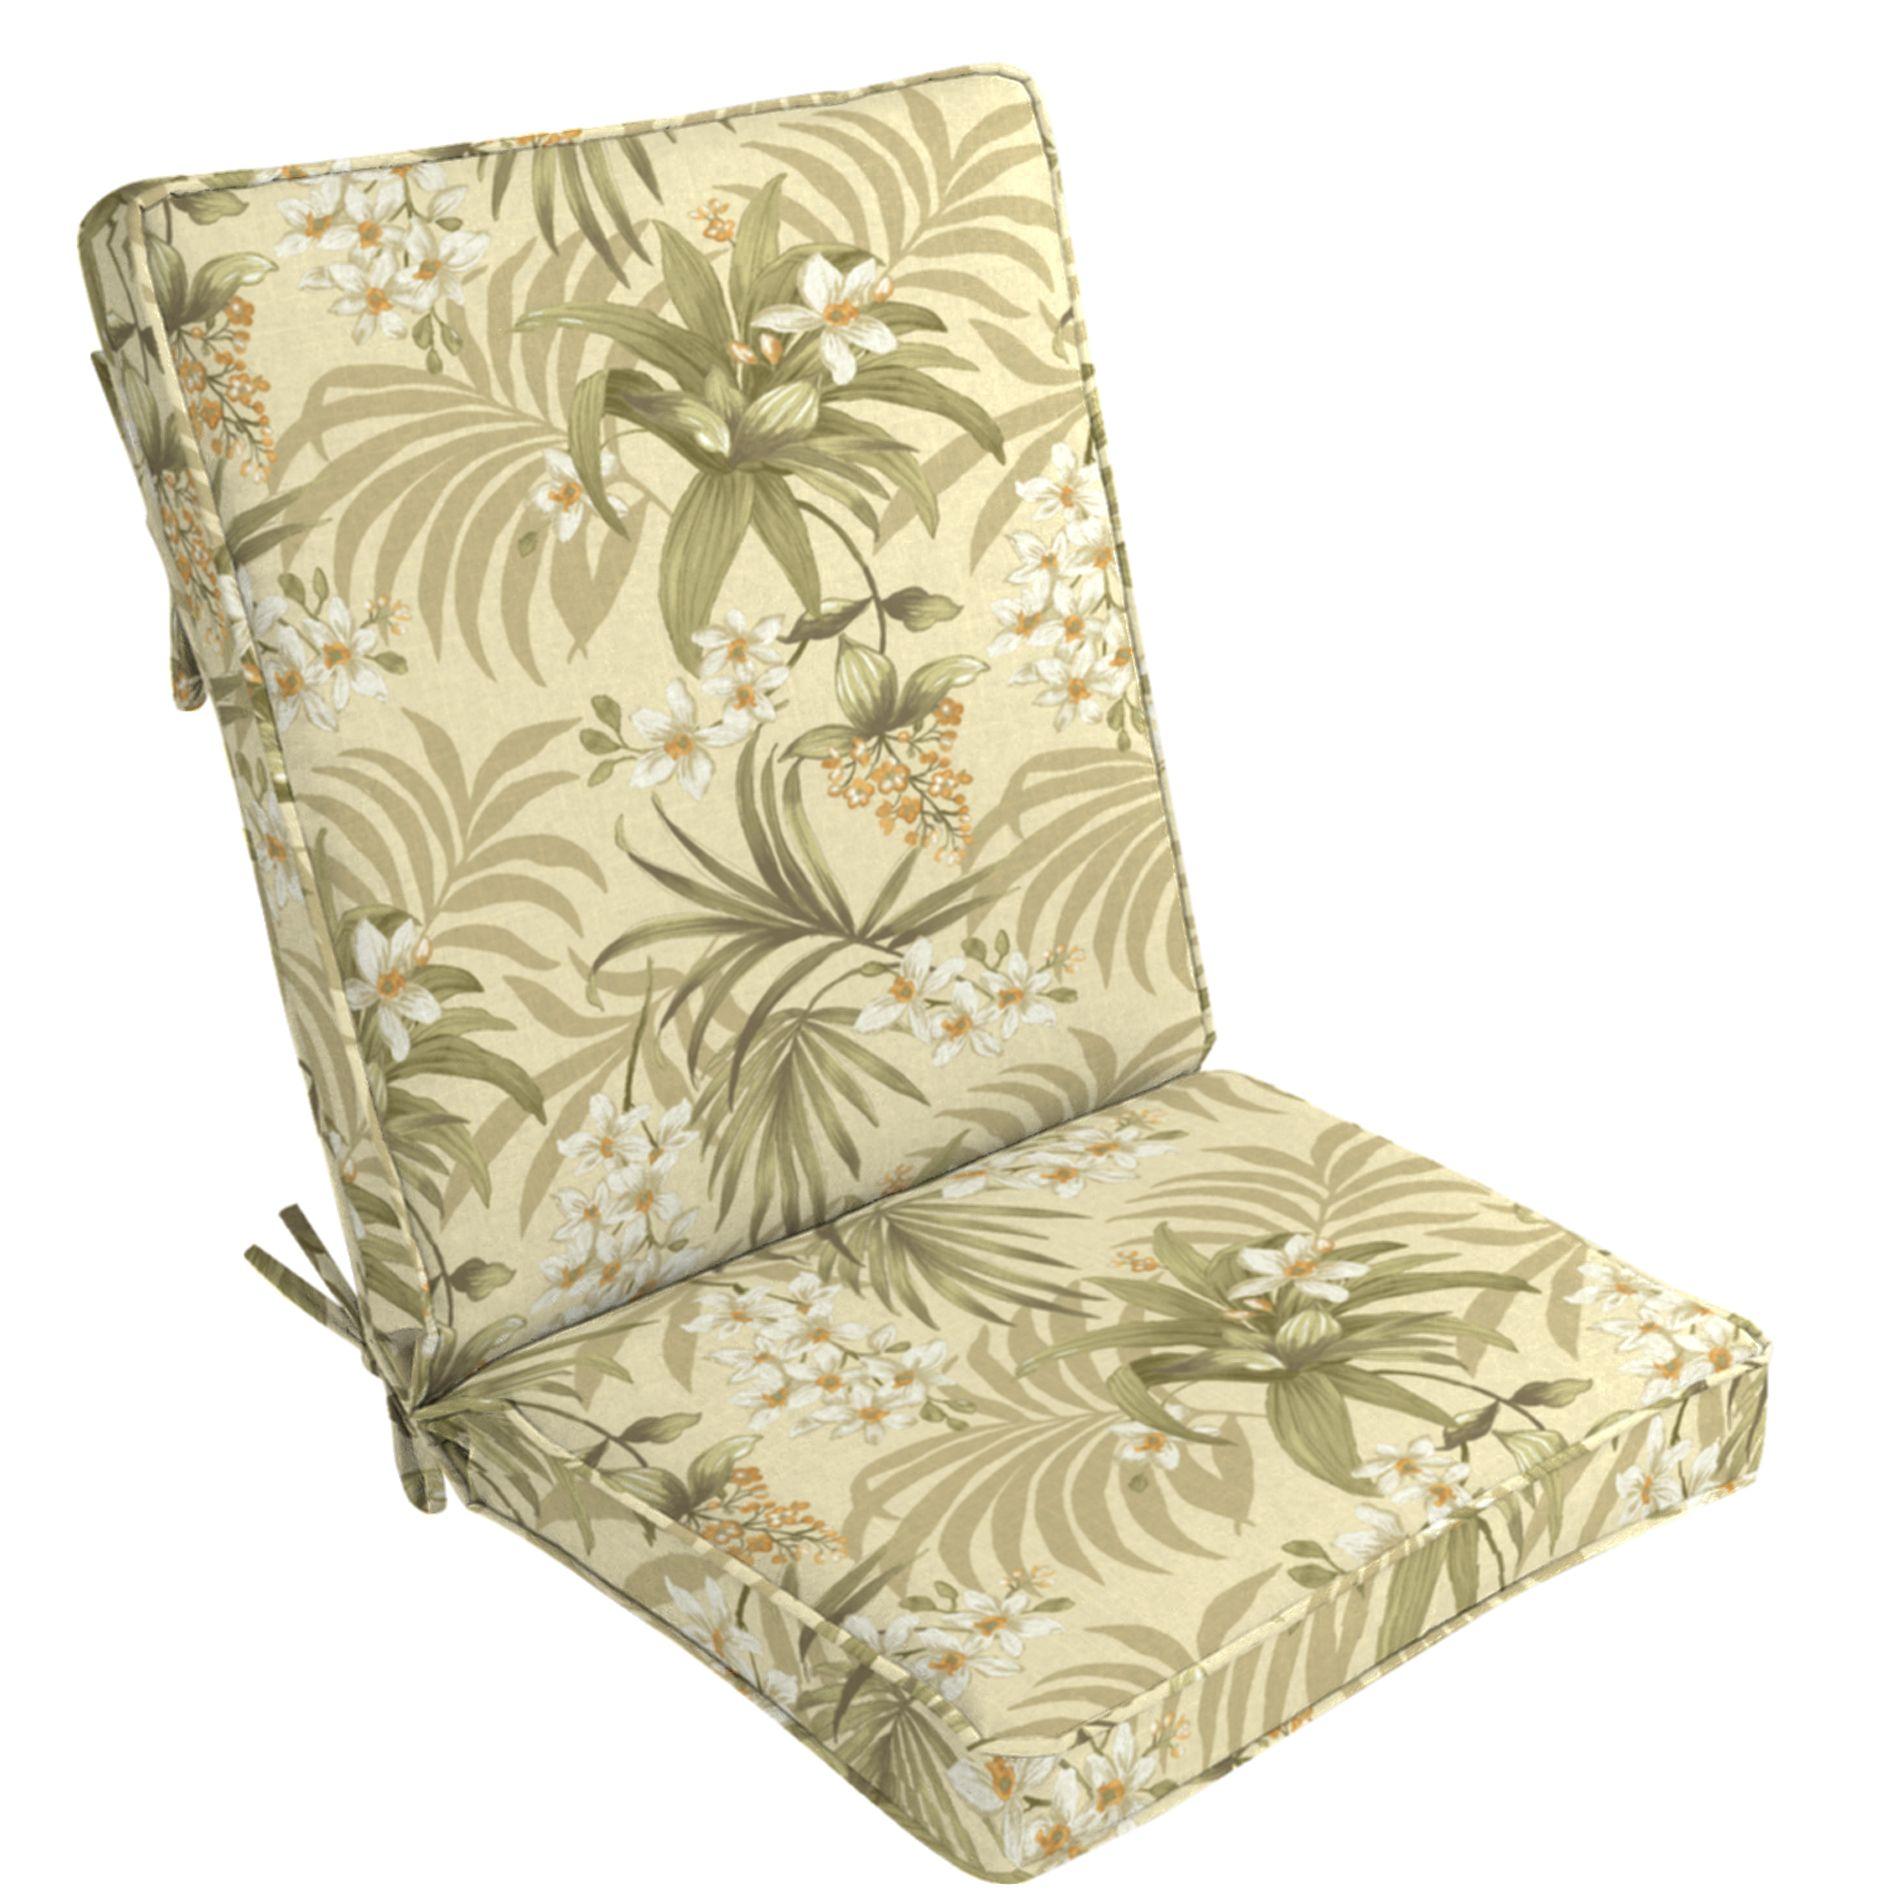 Arden Outdoor Patio High Back Chair Cushion  Doreena Twilight